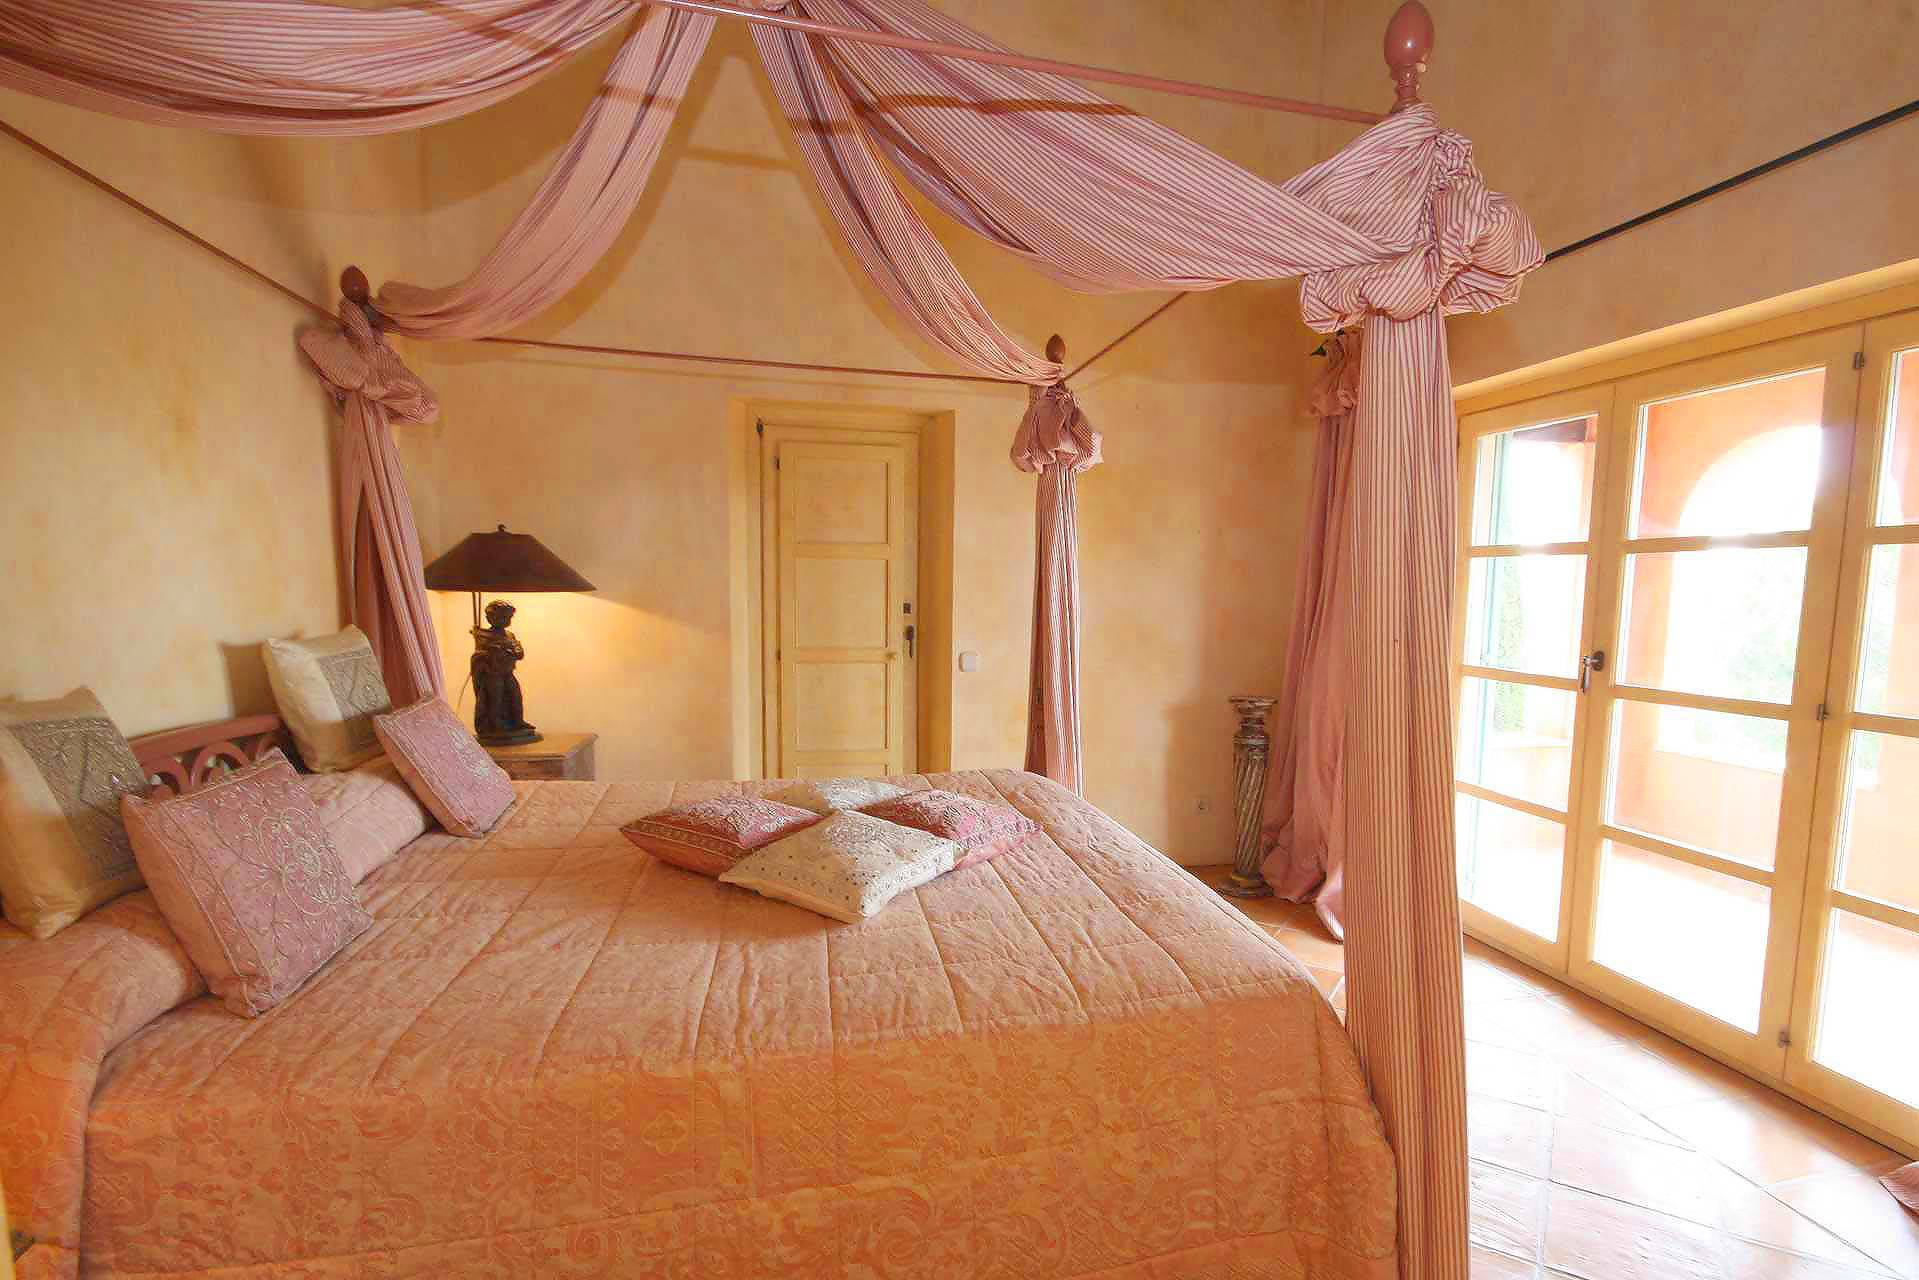 01-98 Extravagantes Ferienhaus Mallorca Osten Bild 33